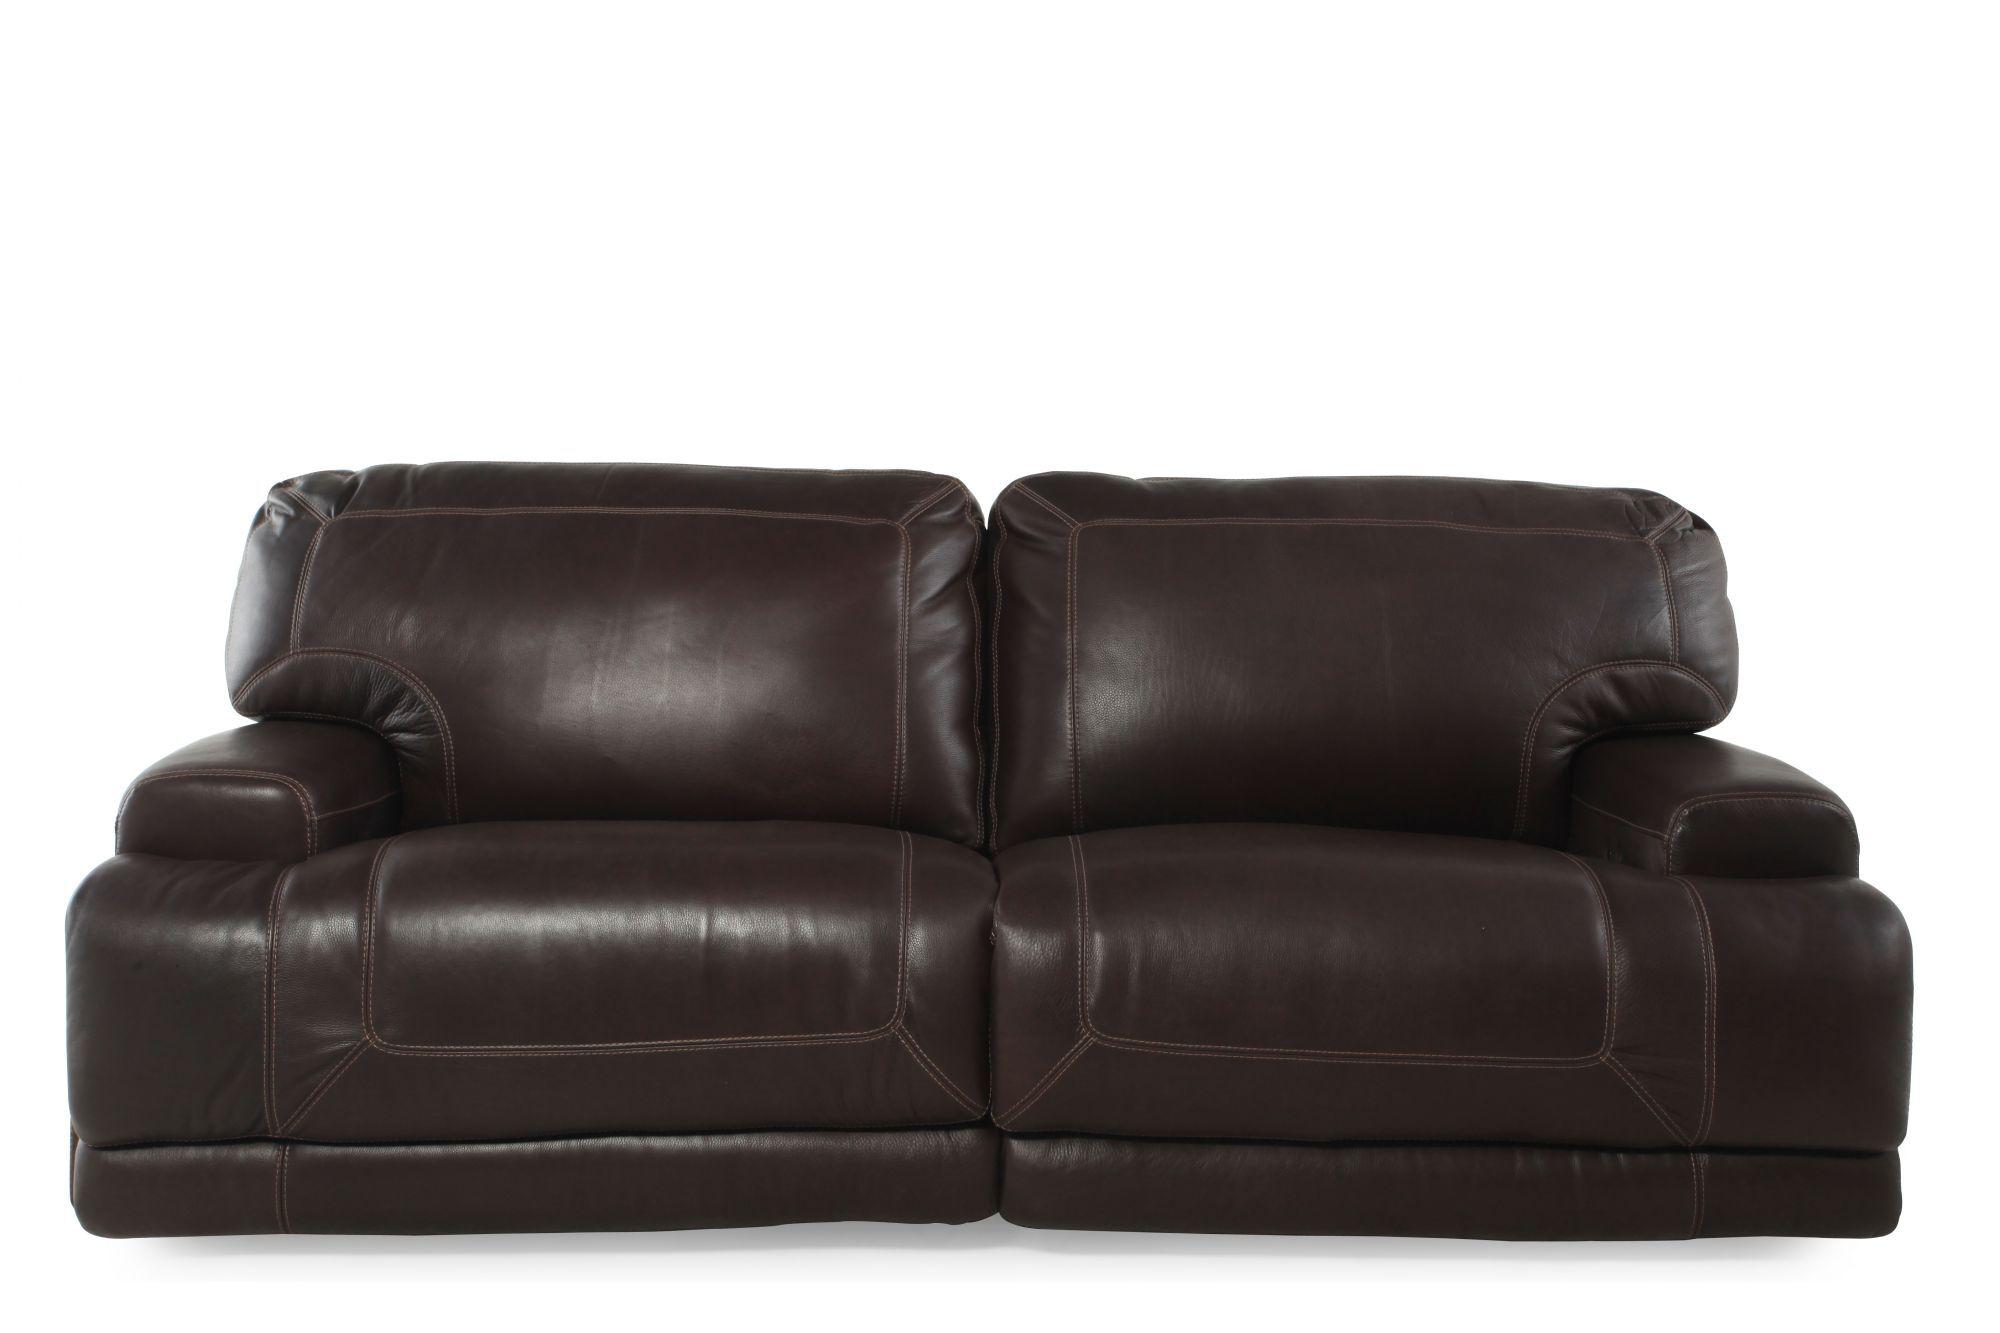 Simon Li Crown Light Walnut Power Reclining Sofa ...  sc 1 st  Mathis Brothers & Simon Li Furniture | Mathis Brothers Furniture islam-shia.org